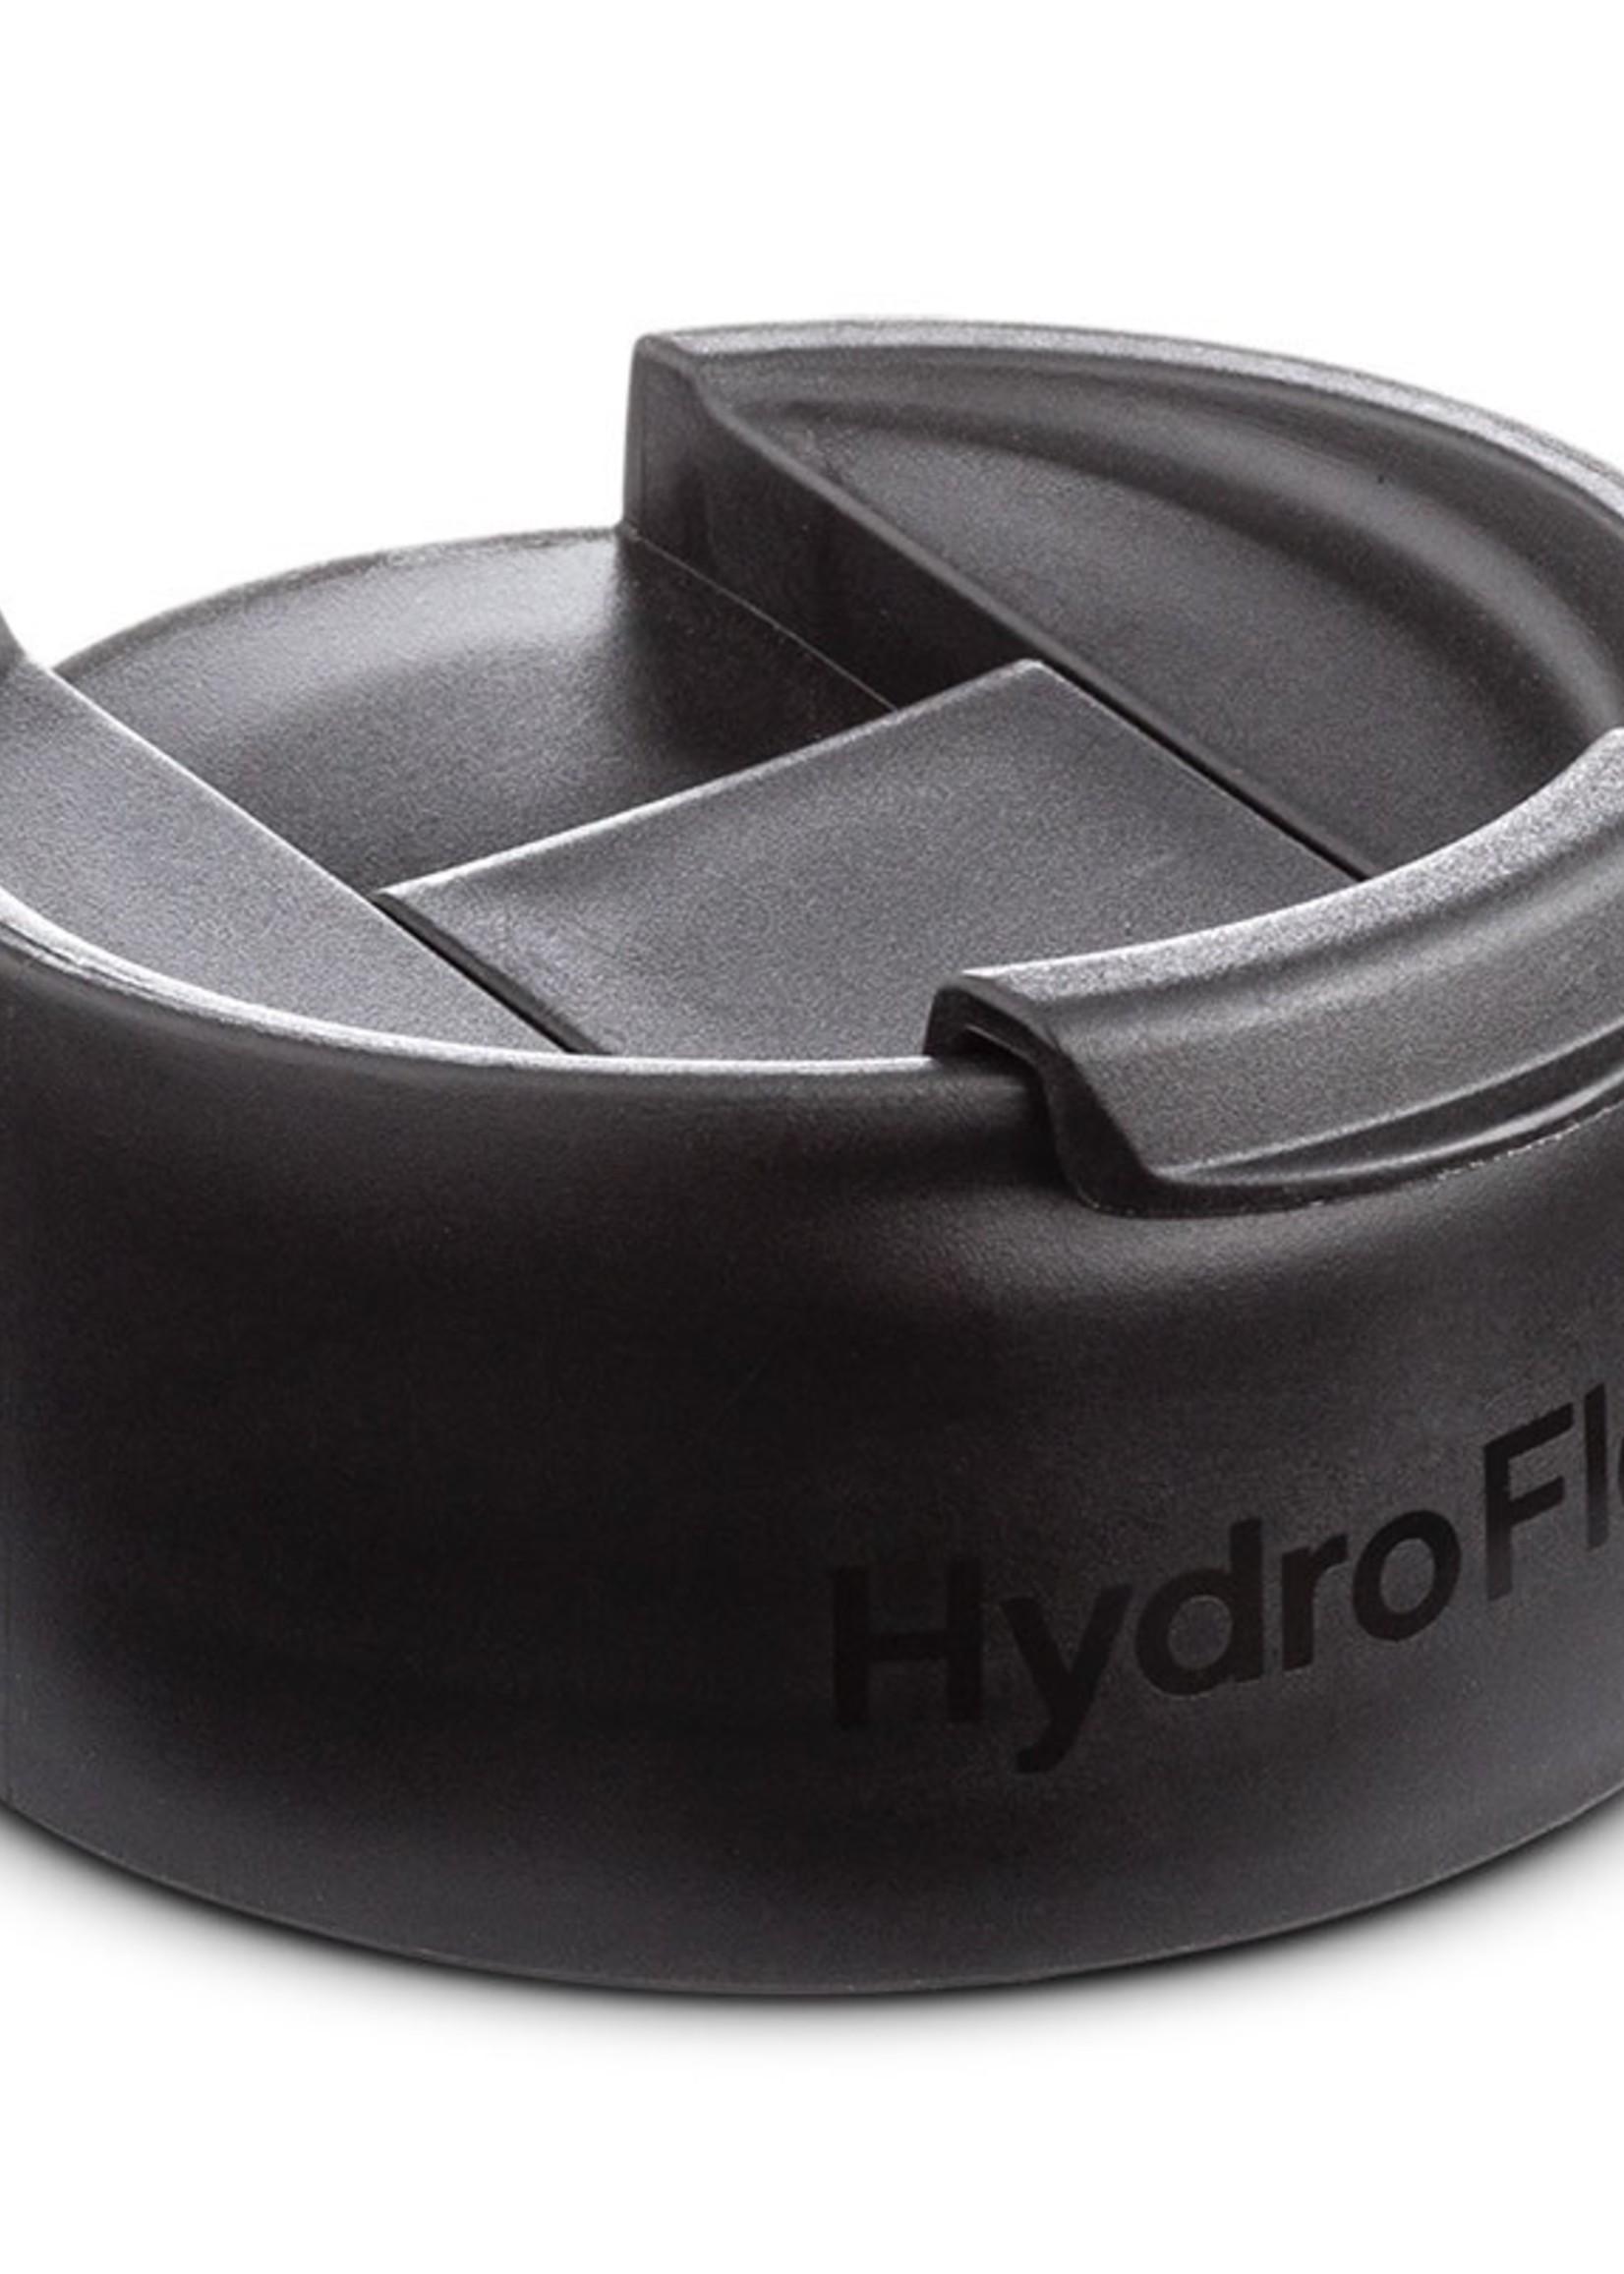 Hydro Flask Hydro Flask Wide Mouth Flip Cap